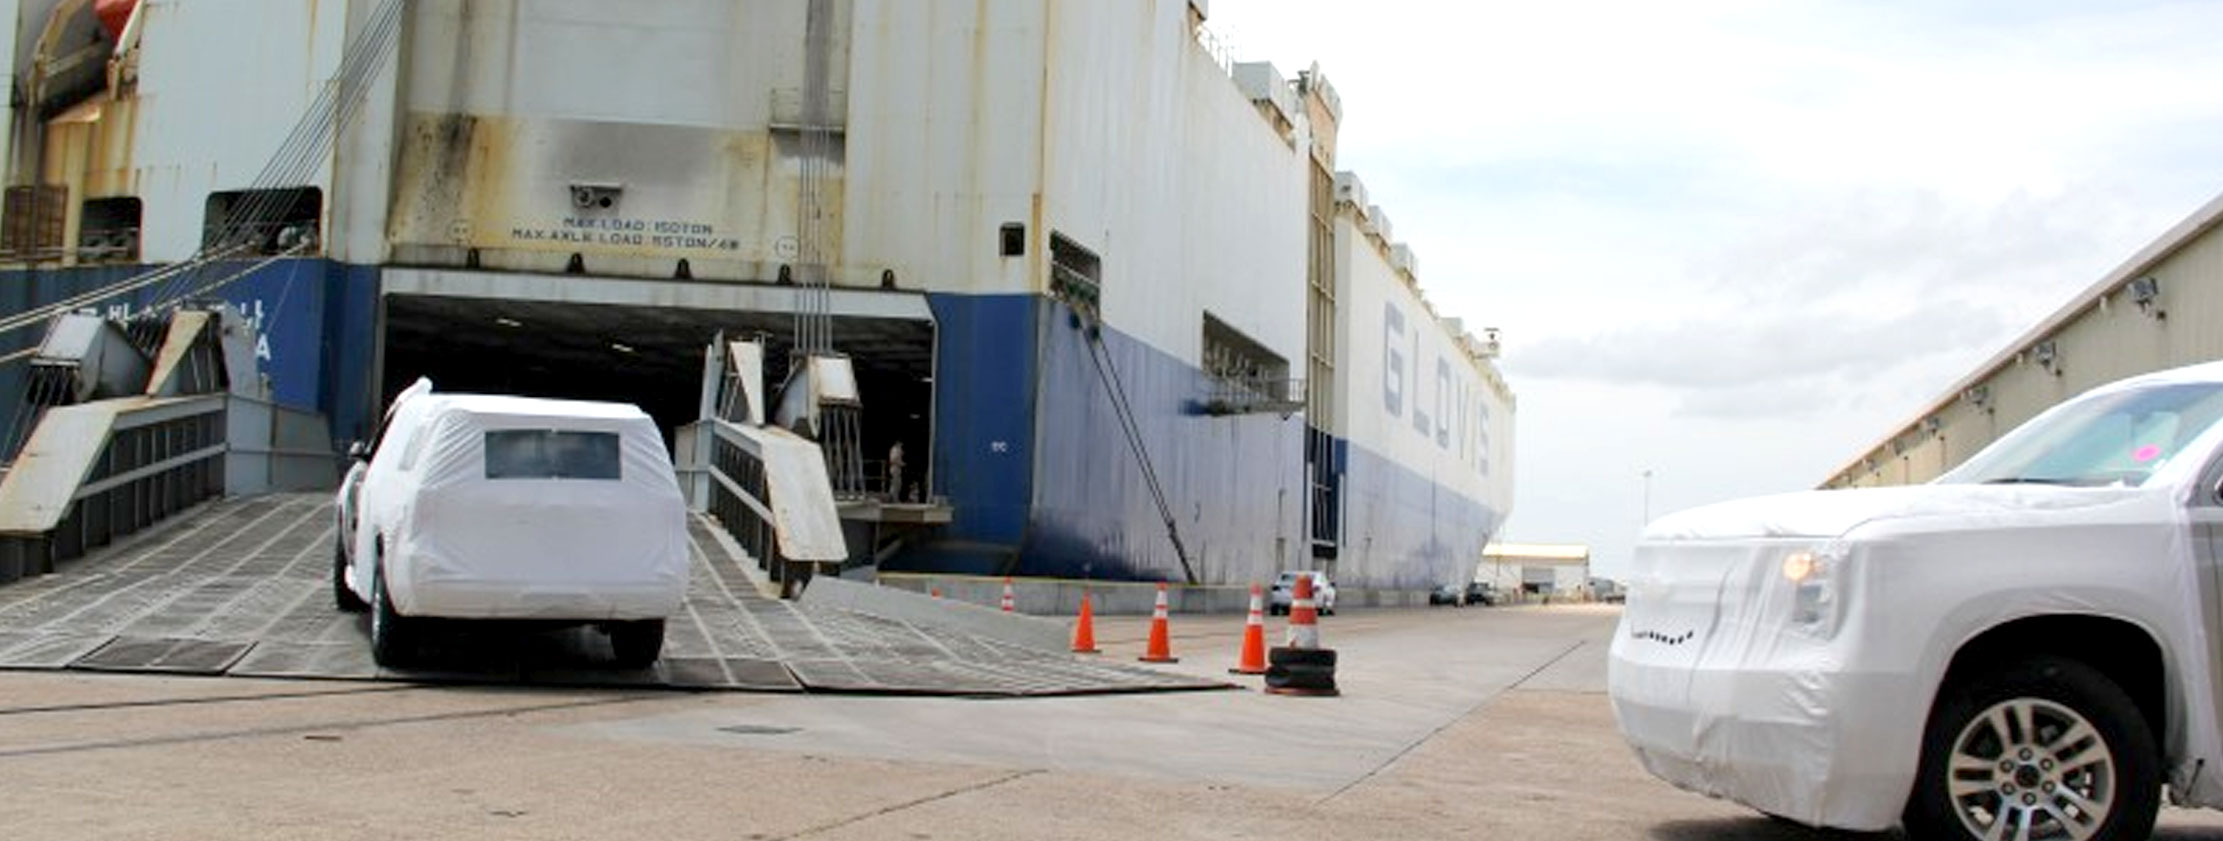 roll on/off port freeport texas